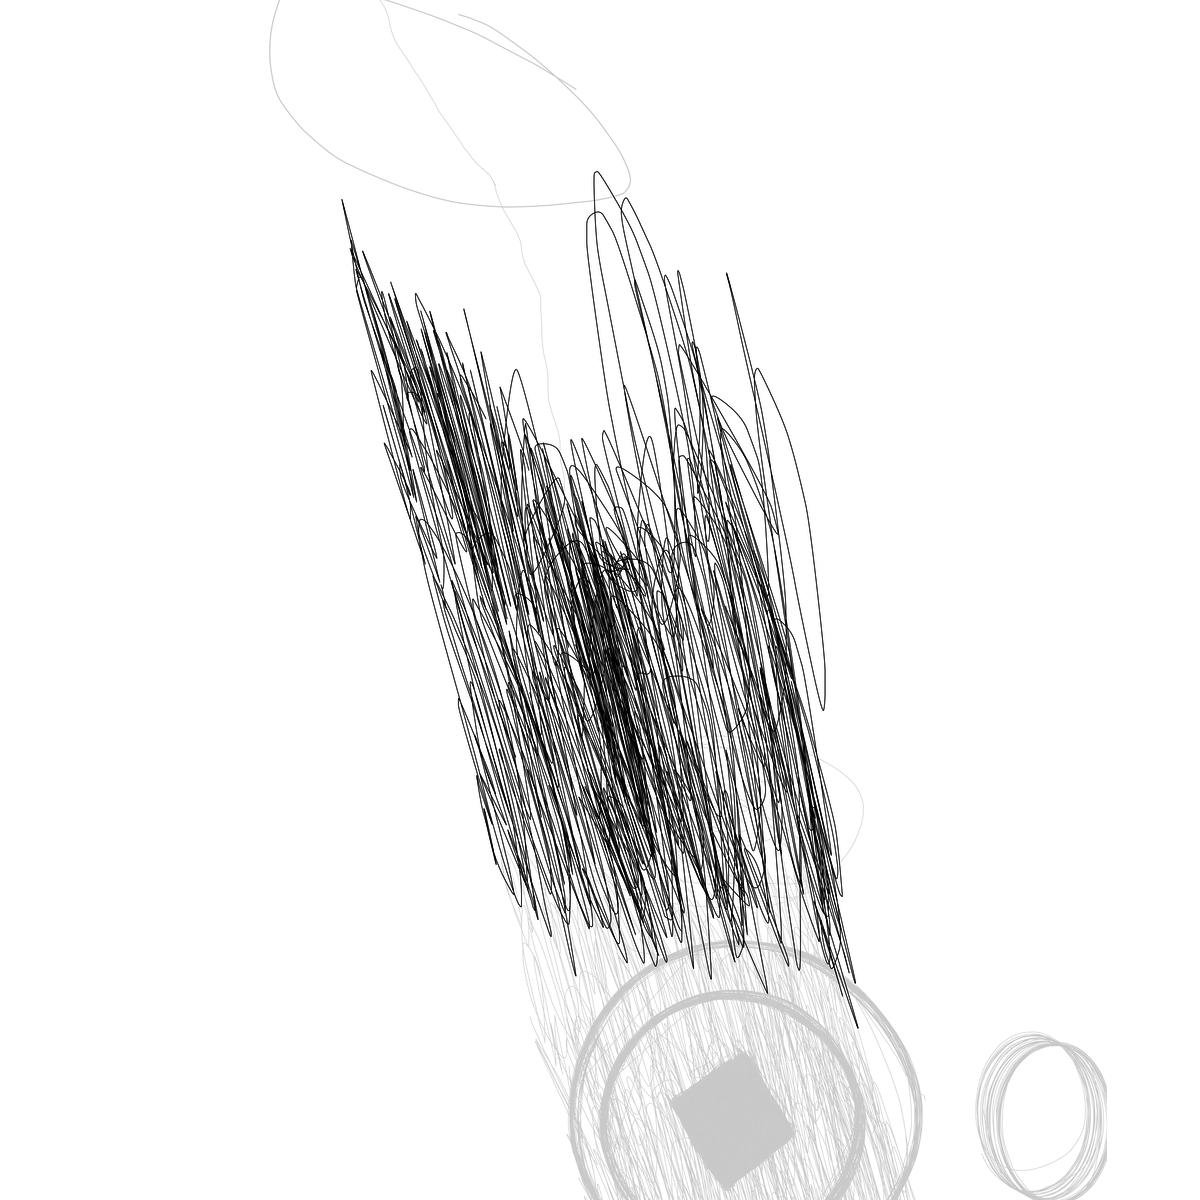 BAAAM drawing#9357 lat:52.4885597229003900lng: 13.4249153137207030